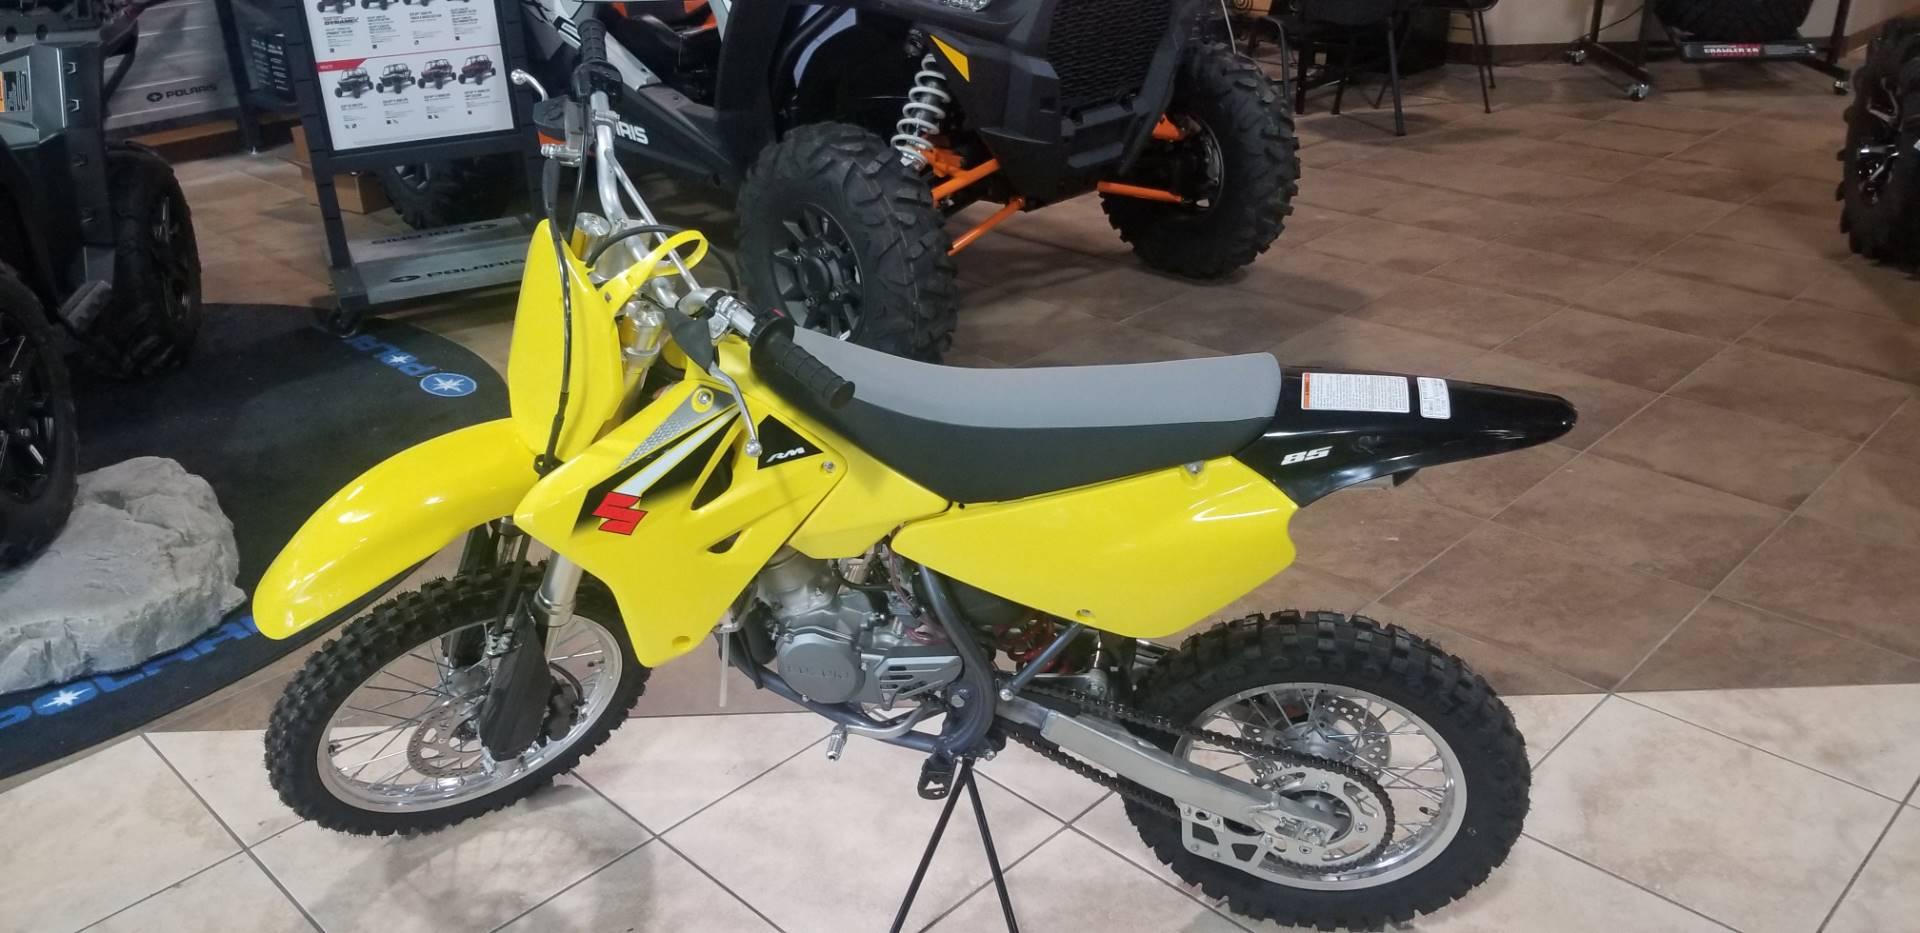 ... service manual qty 1 walmart com rh Array - new 2016 suzuki rm85  motorcycles in statesboro ga s100085 rh statesboropowersports org